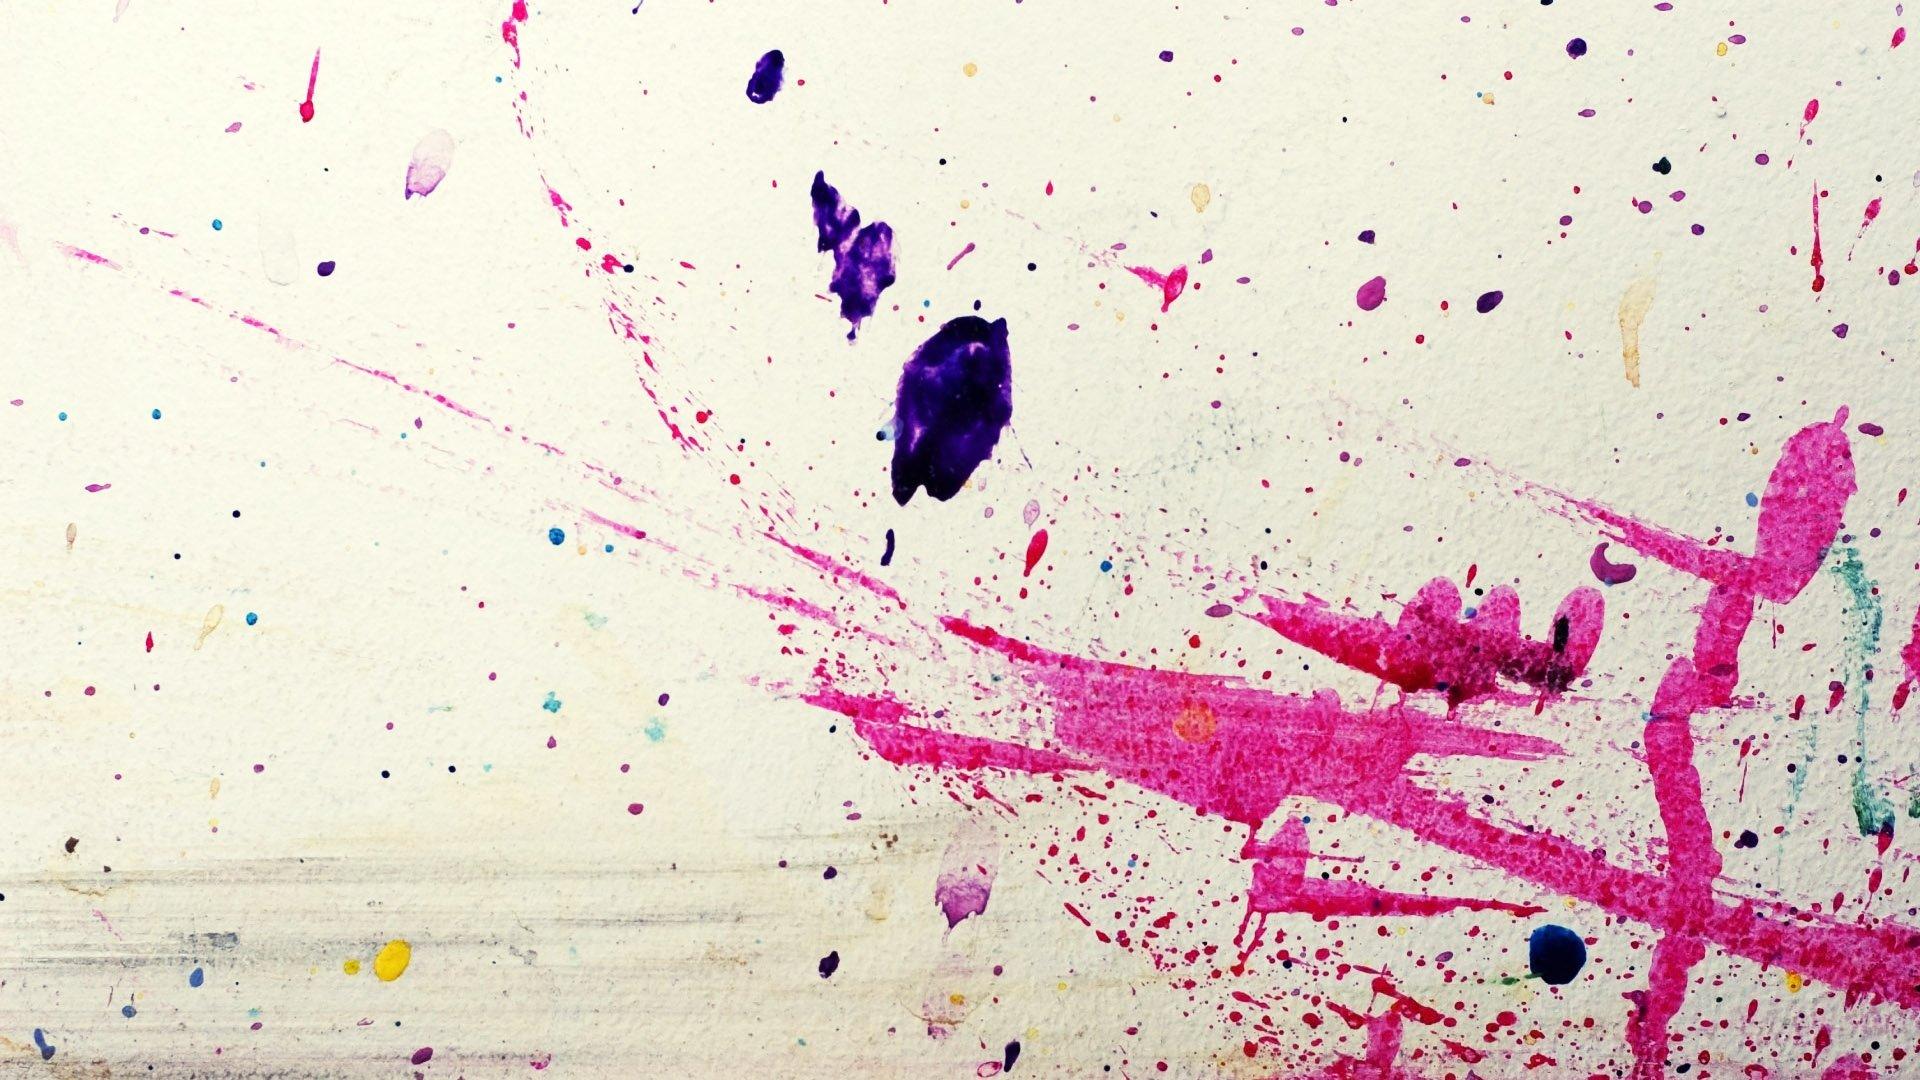 Hd wallpaper gun - Splatter Backgrounds Wallpapersafari